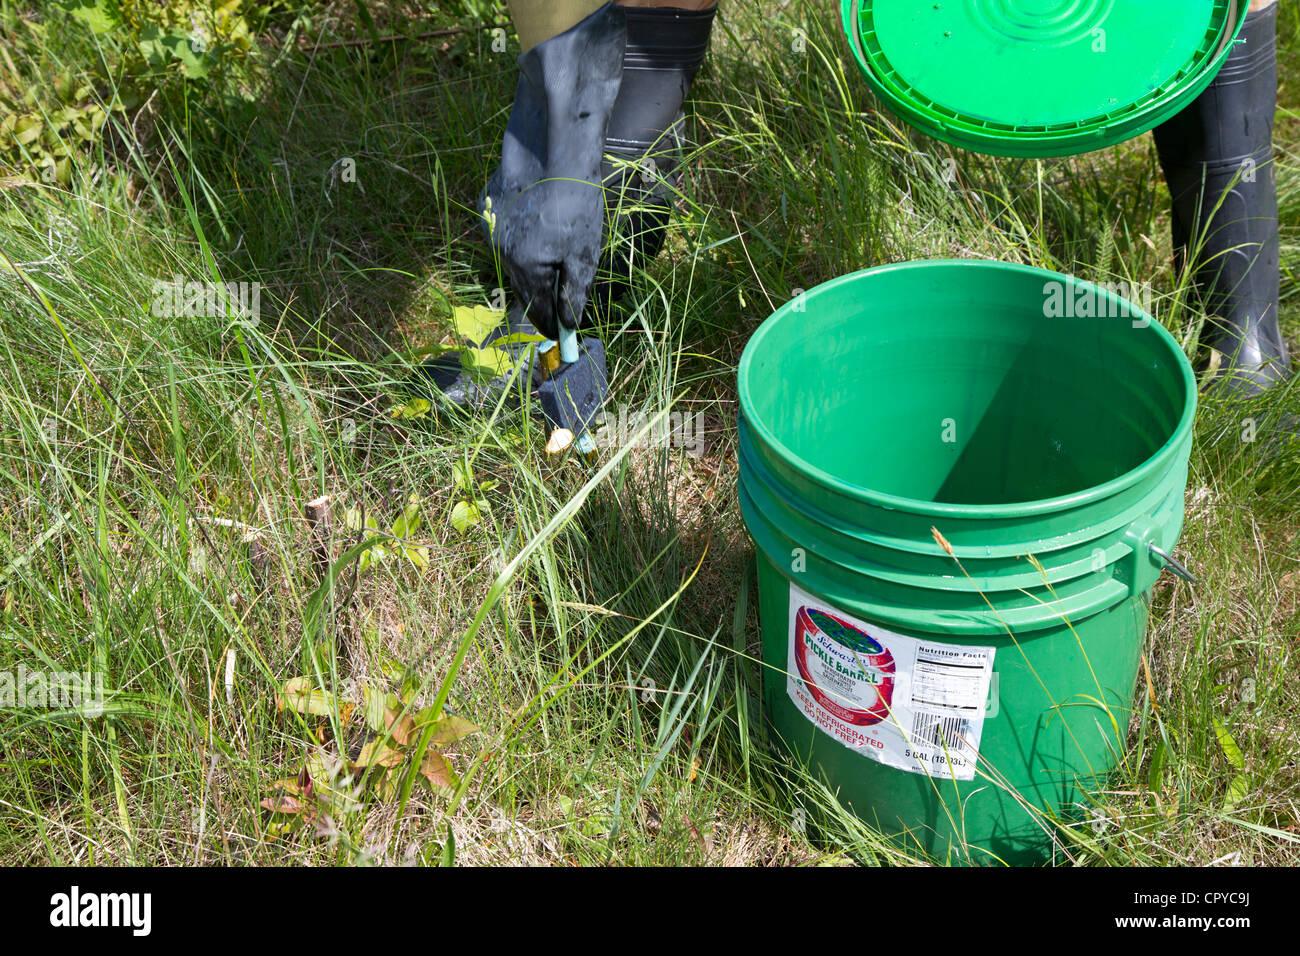 Volunteers remove invasive buckthorn from a prairie habitat. - Stock Image